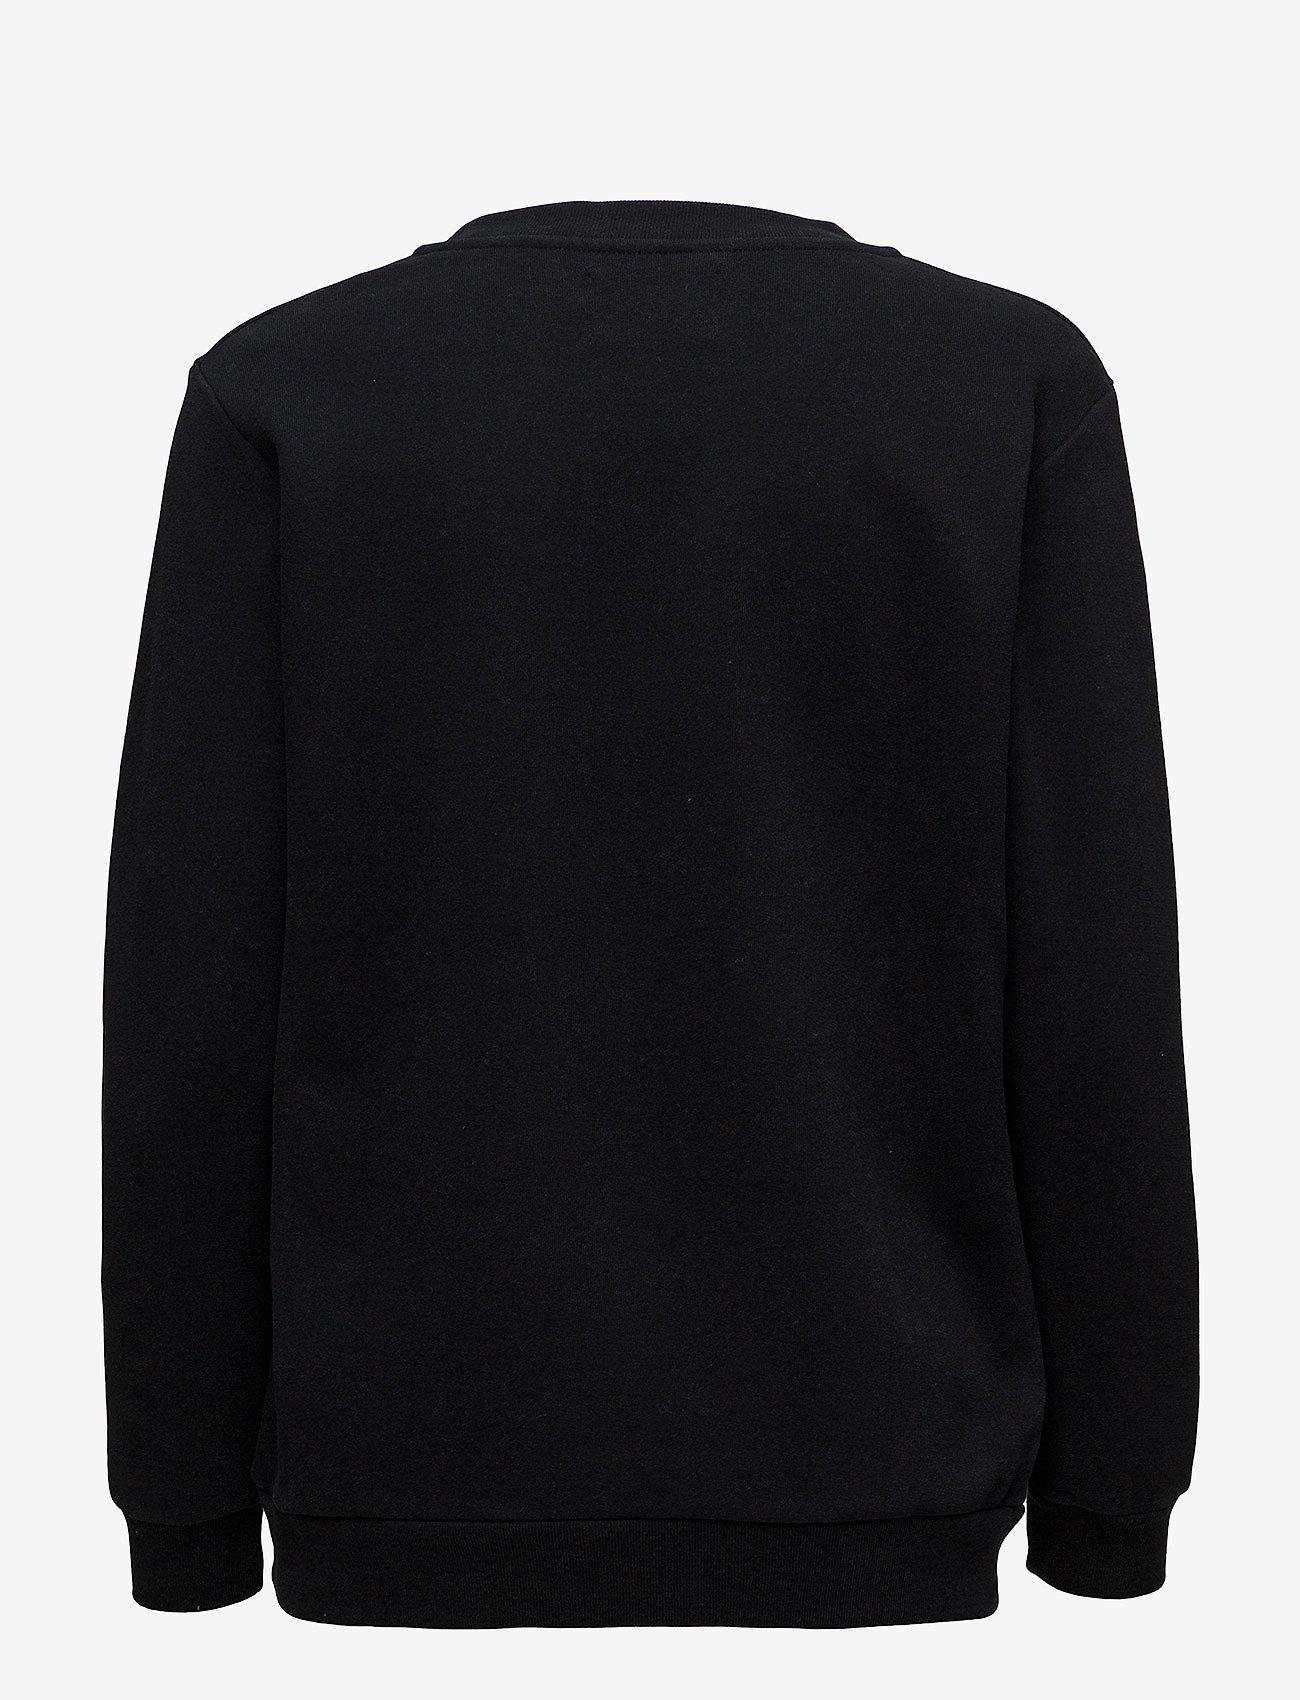 Calvin Klein Jeans - CORE MONOGRAM LOGO SWEATSHIRT - sweatshirts - ck black - 1